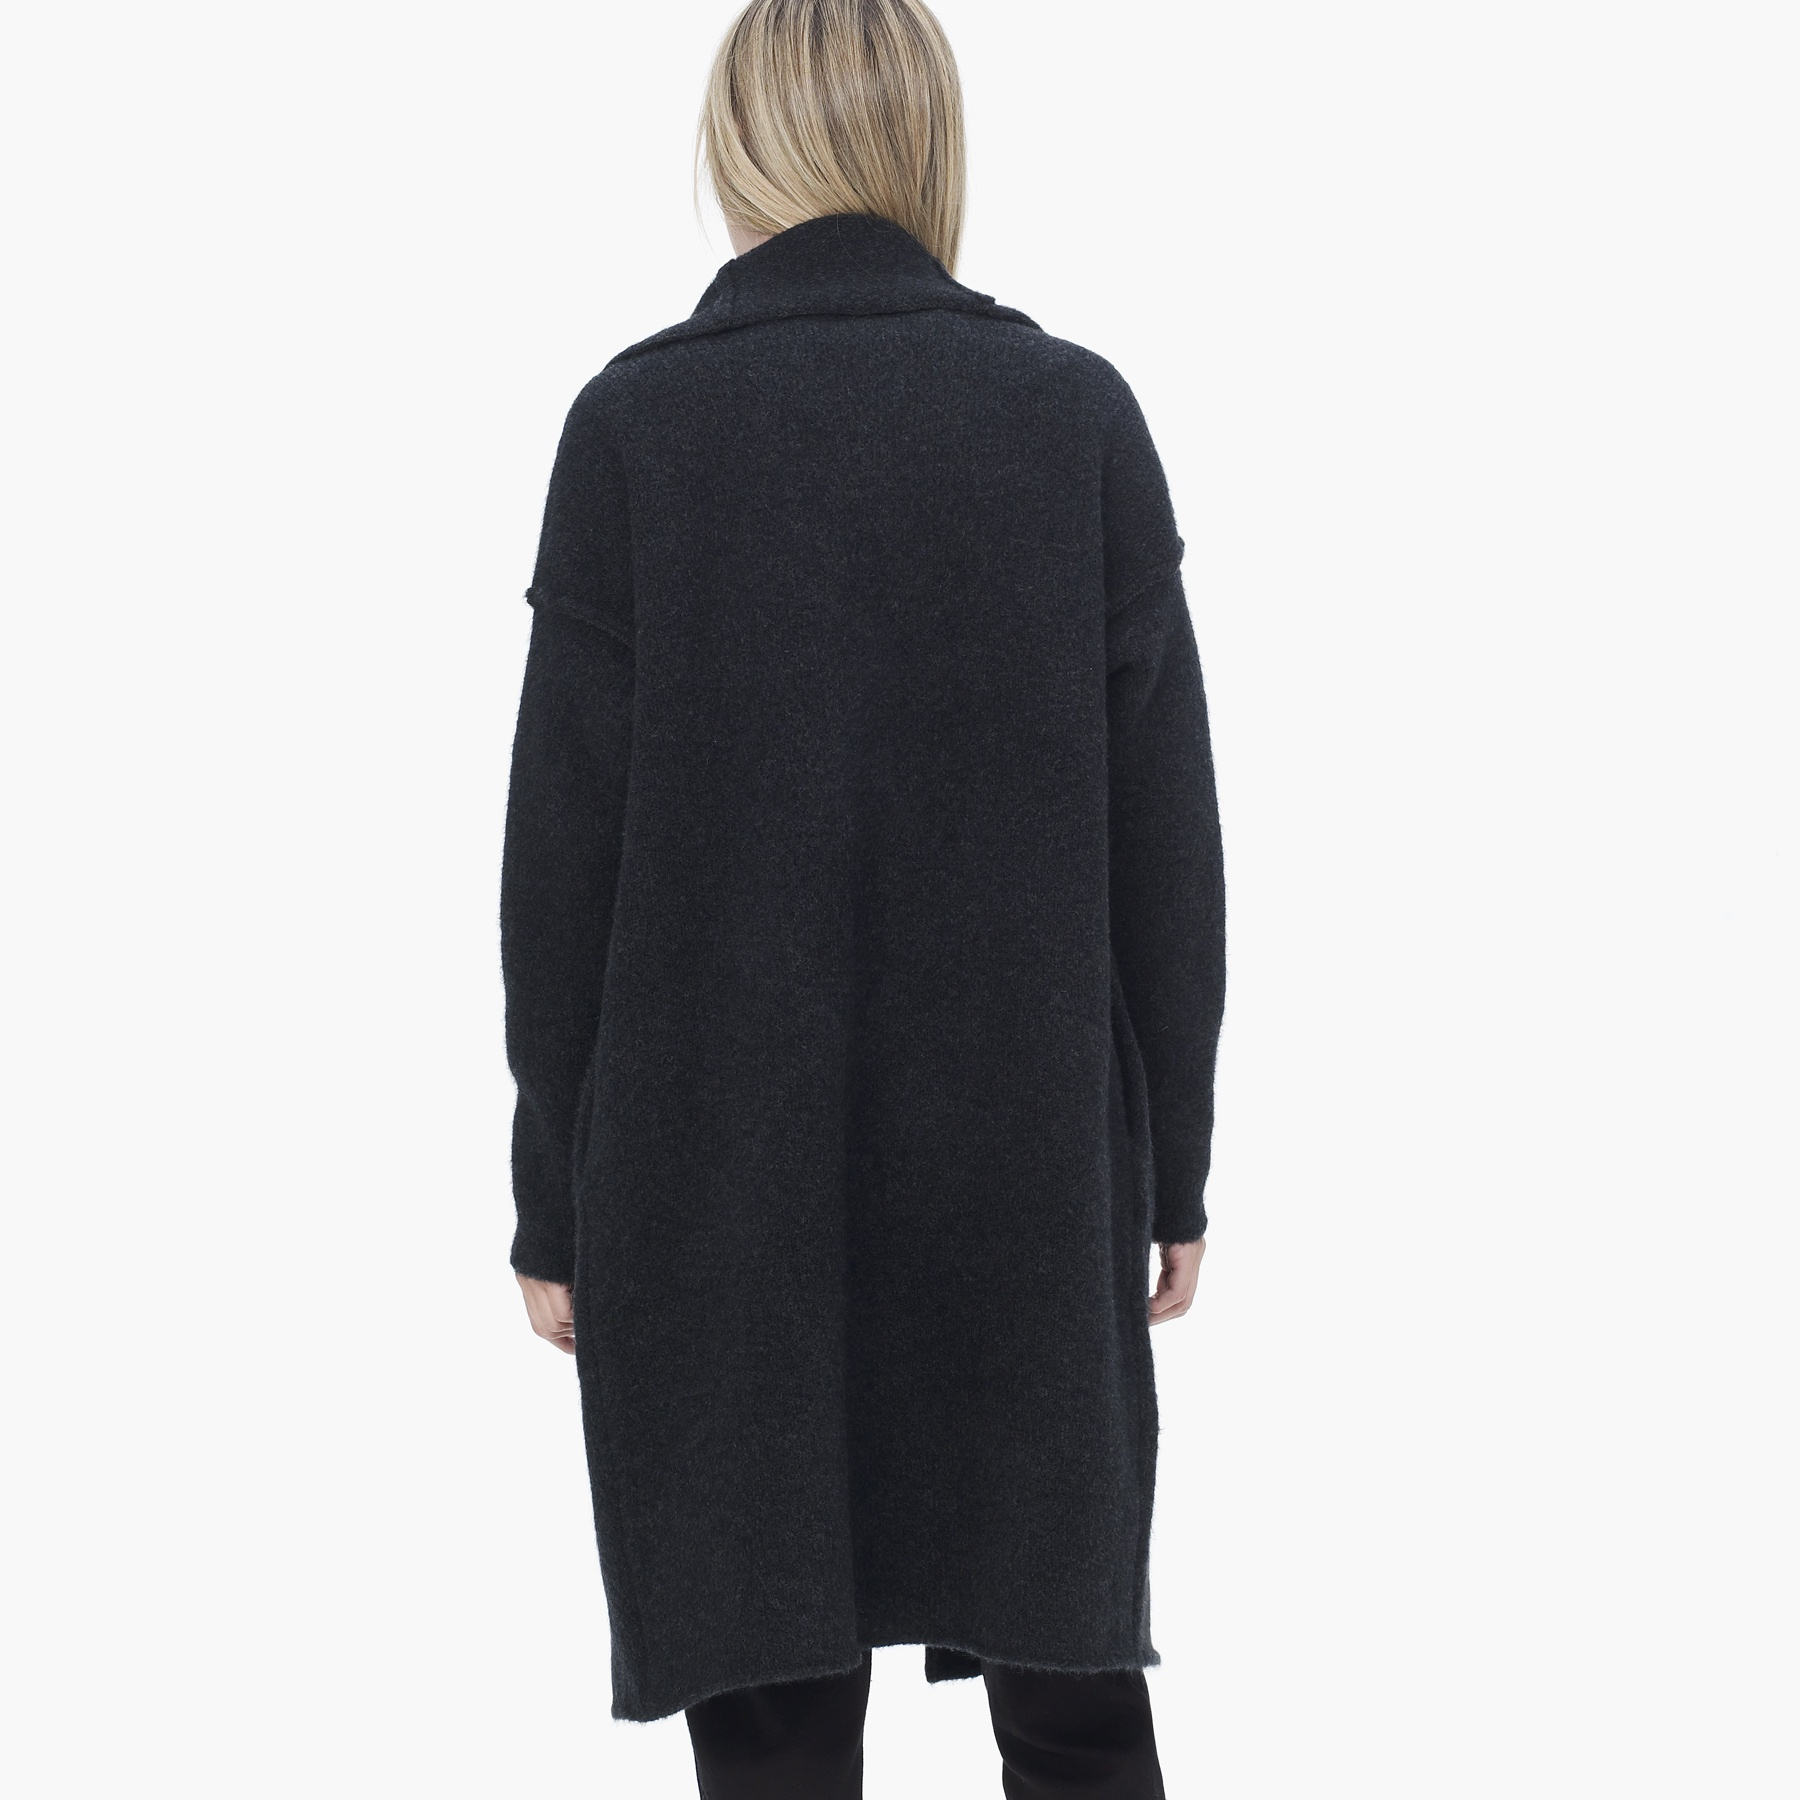 James perse Blanket Sweater Coat in Gray | Lyst